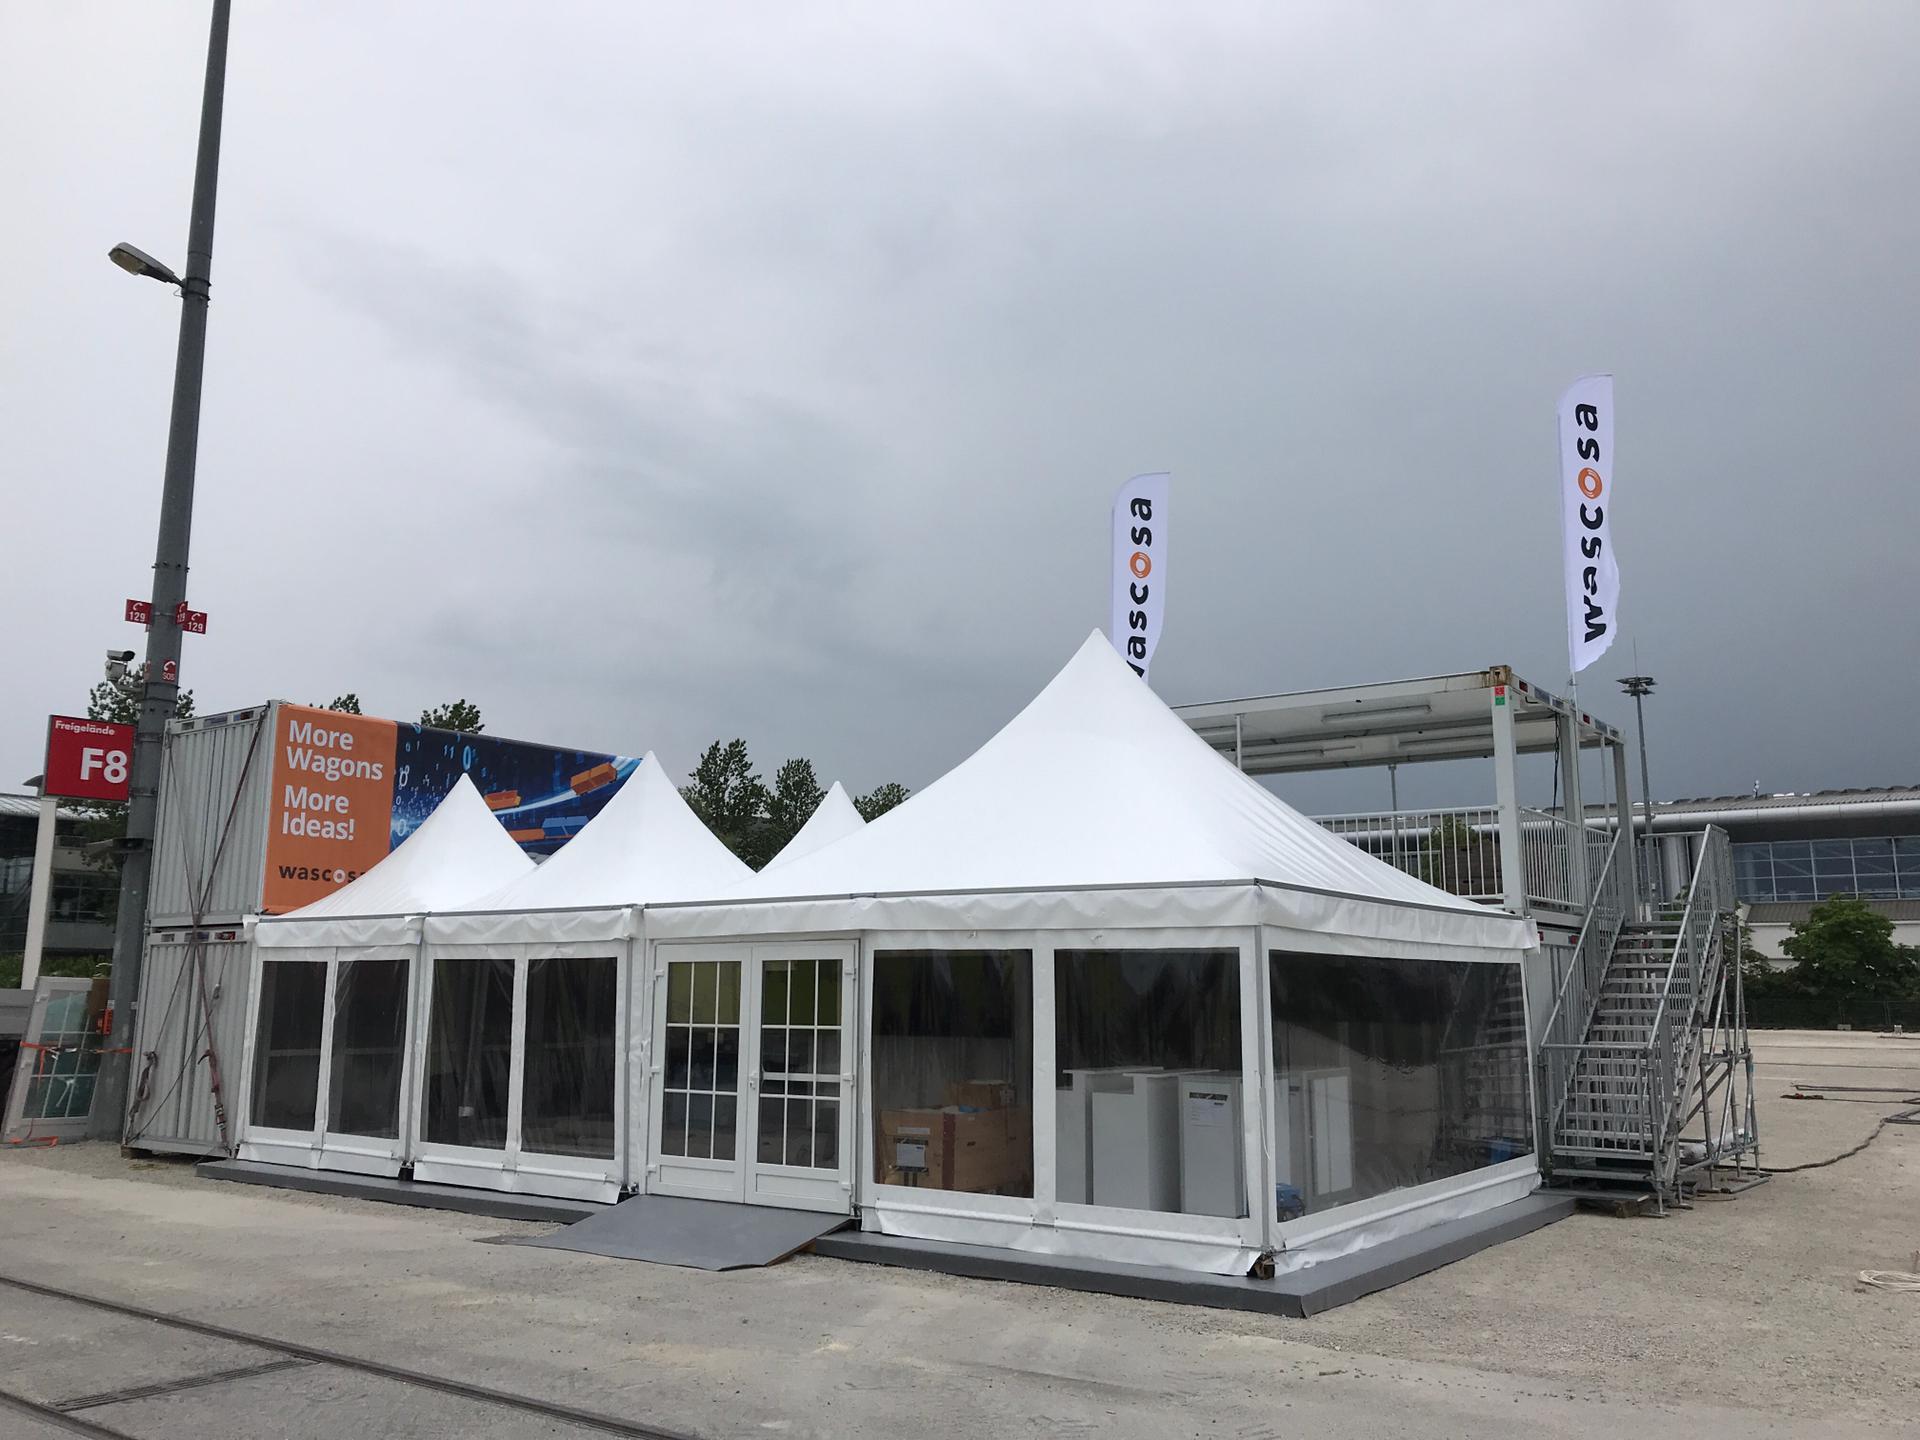 WASCOSA Messe München 2019 (3).jpg